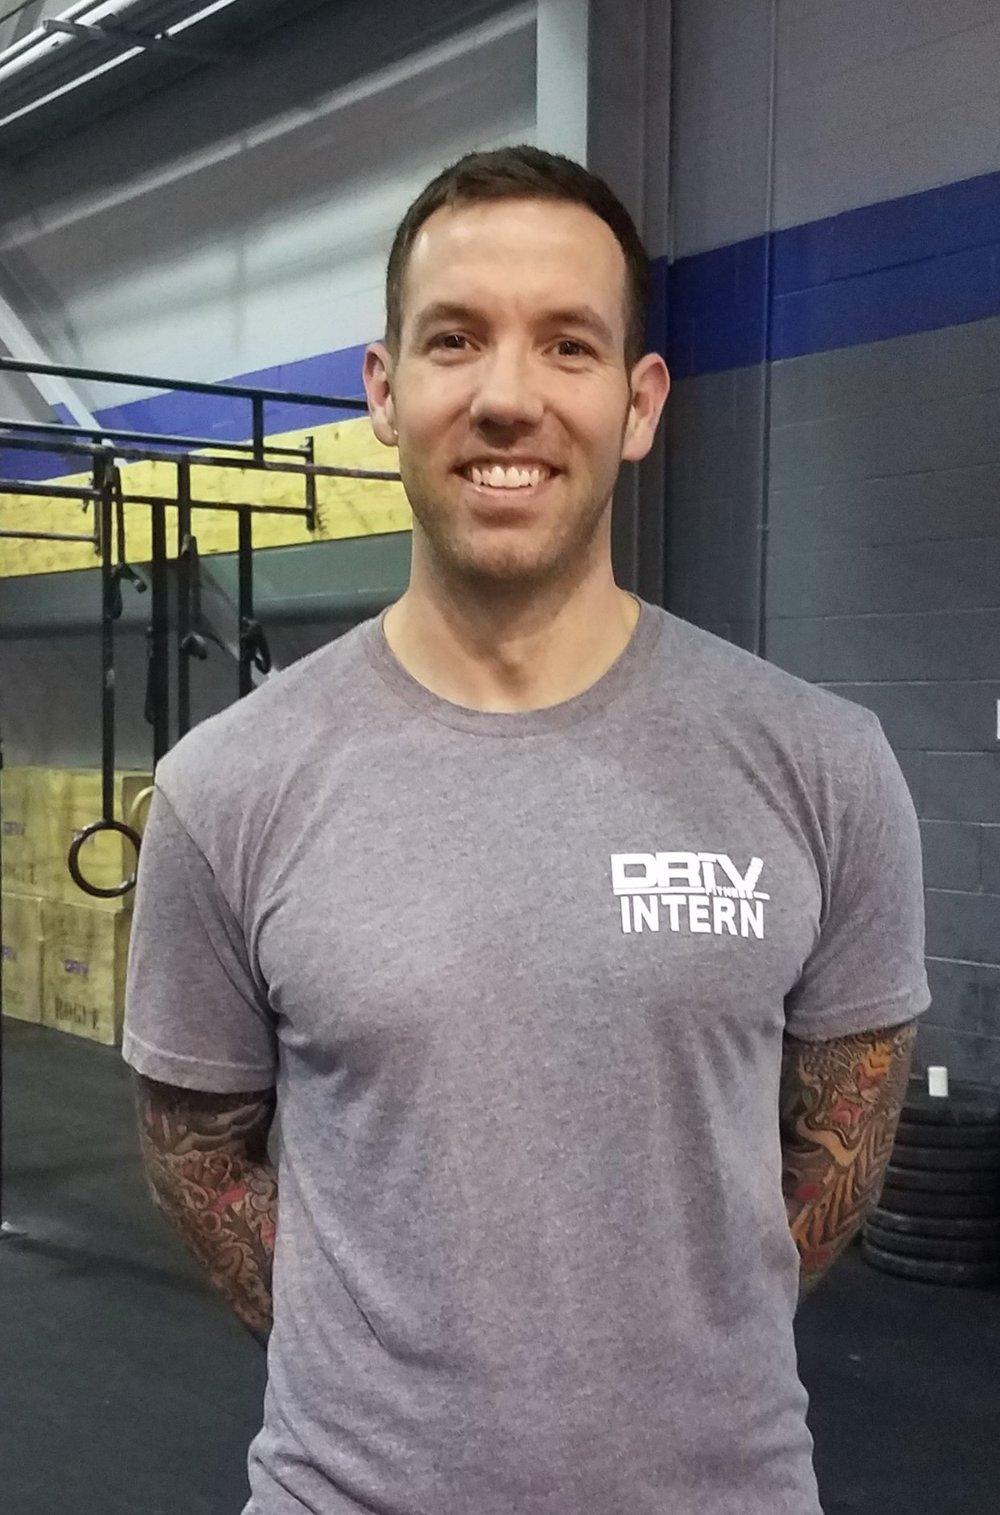 Sean Schoeneman Coach, F.I.T. Director - CrossFit Courses - Level 1, 2, 3 & Masters